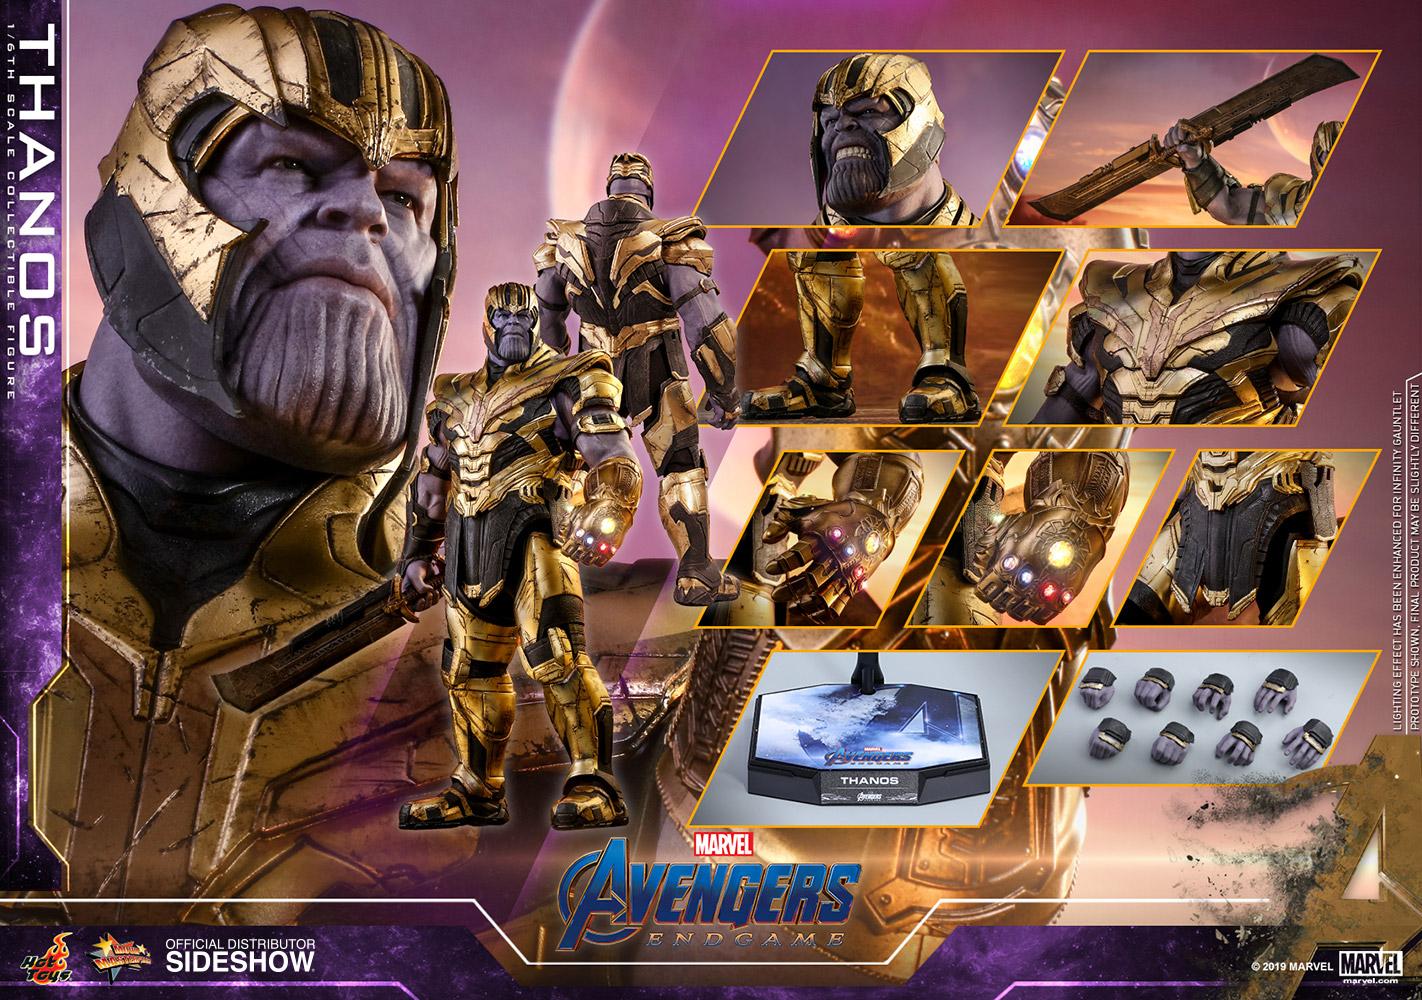 Avengers: Koniec gry - figurka Thanos